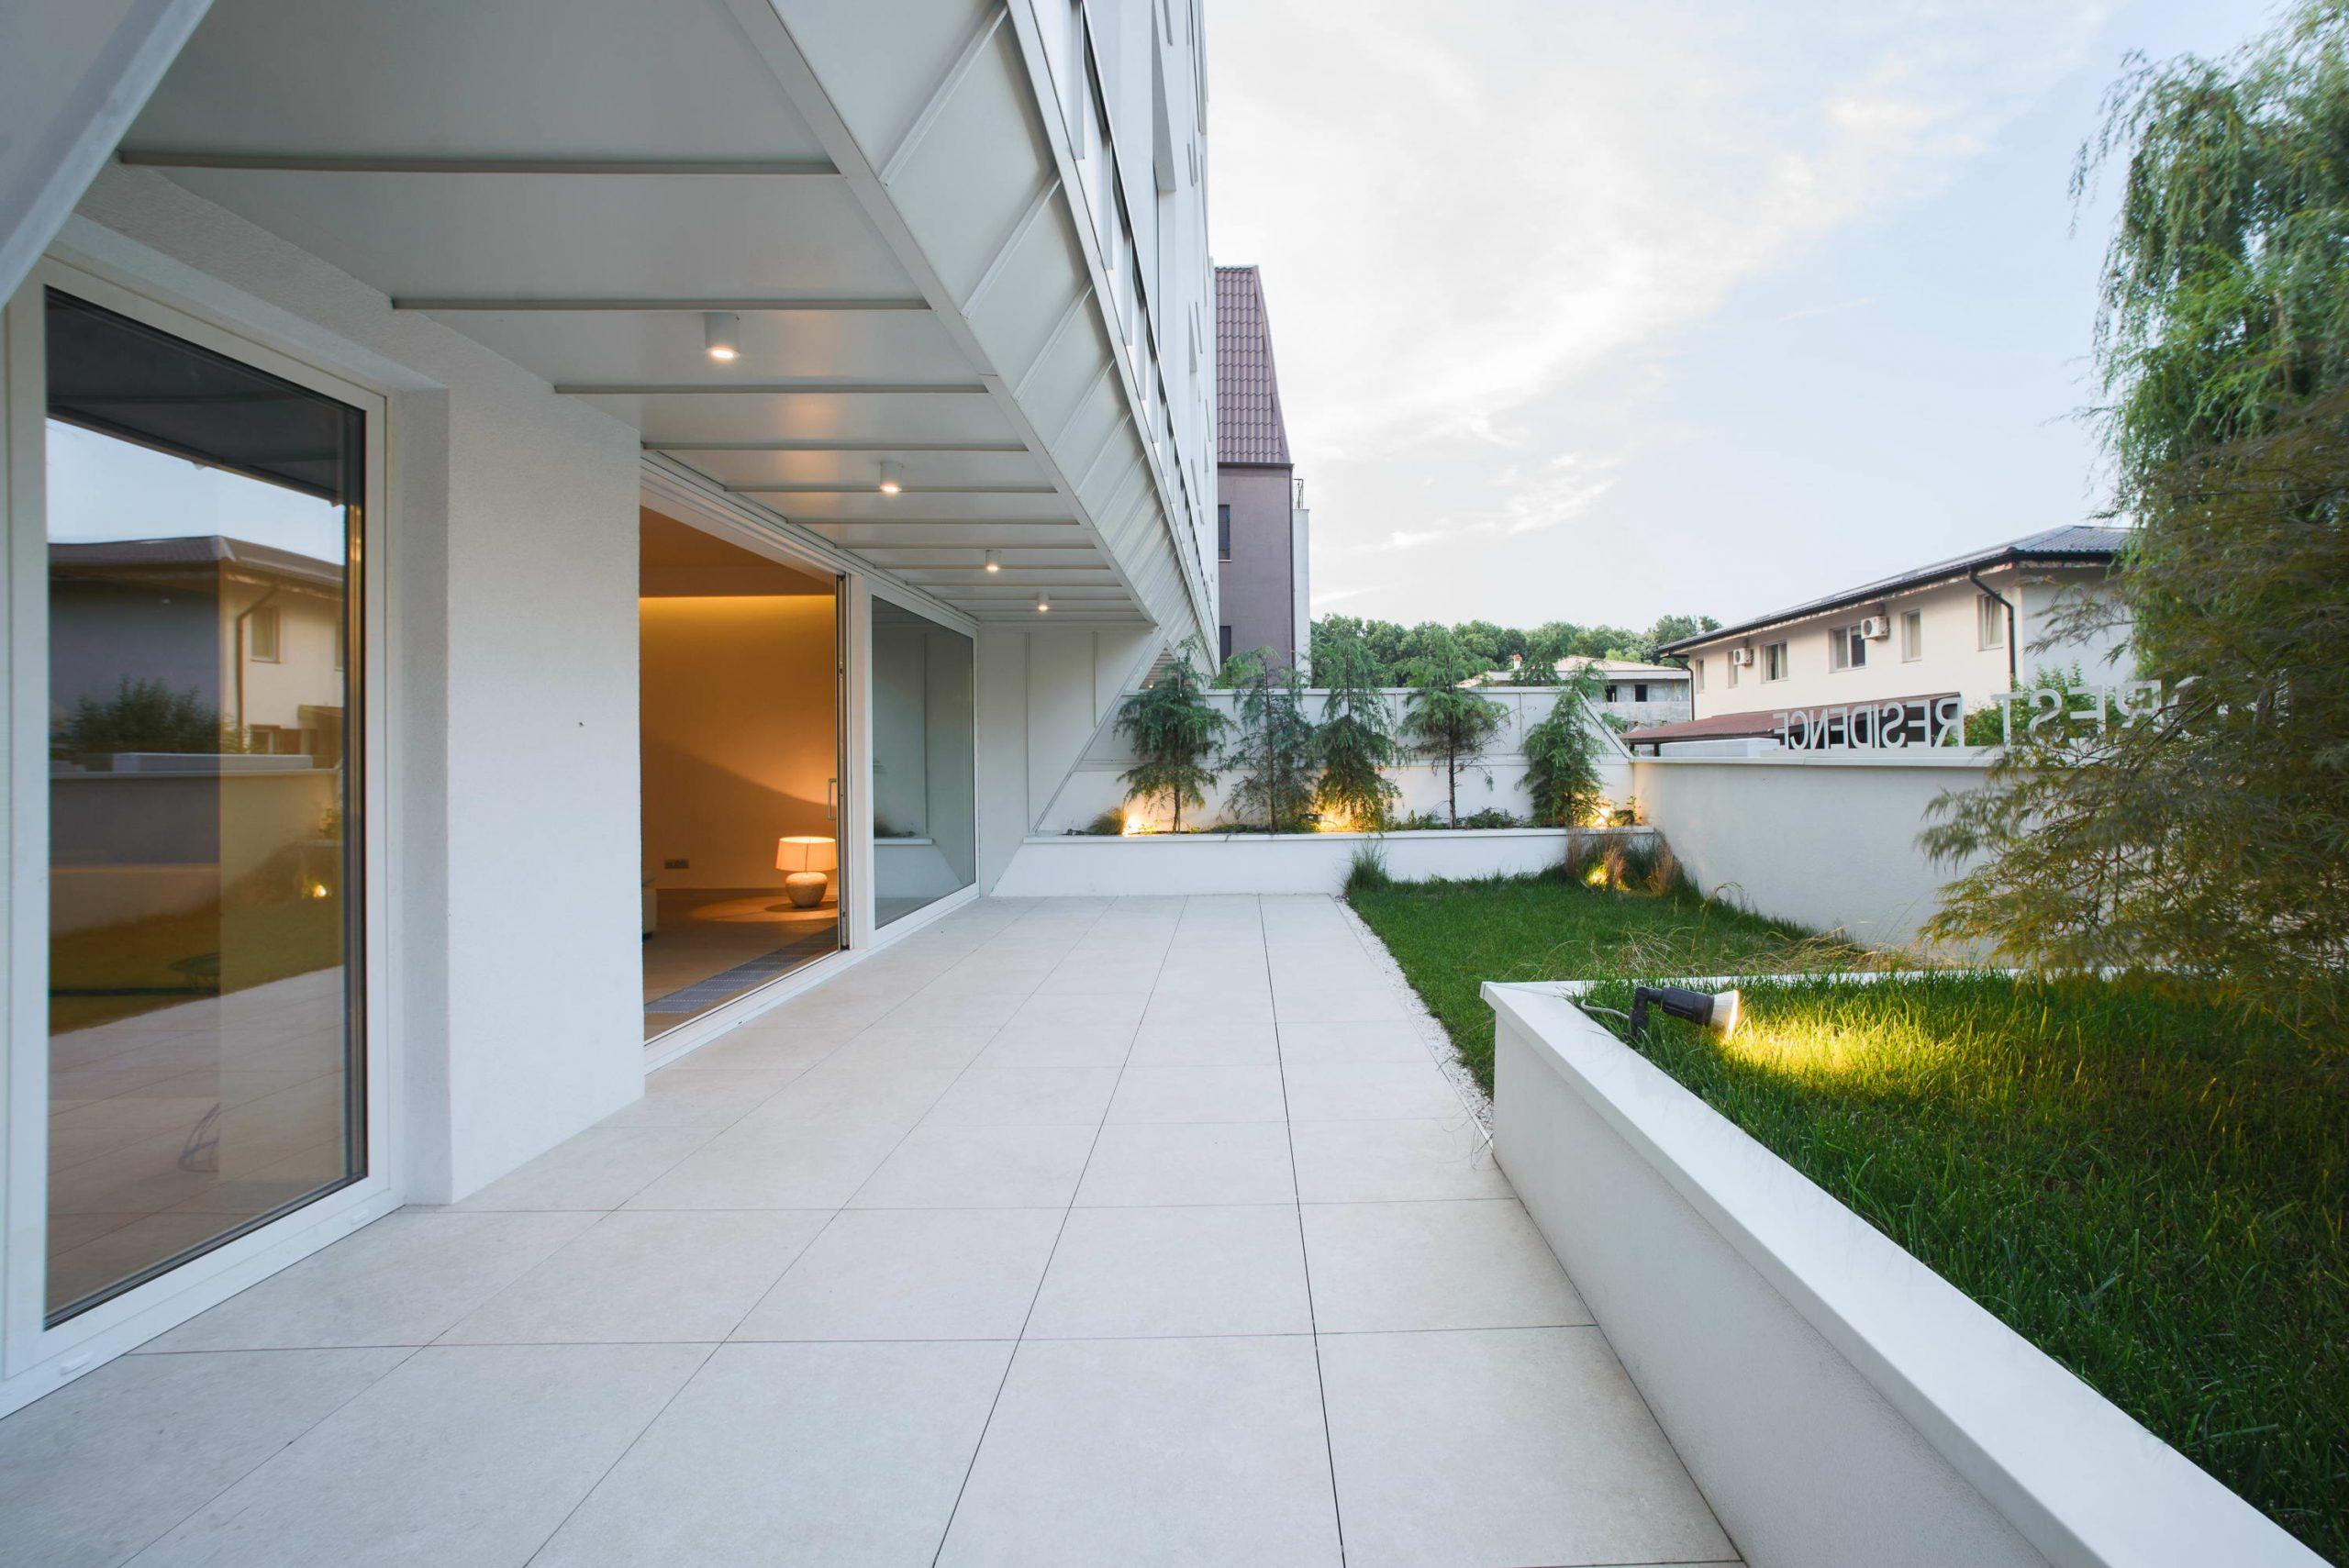 https://nbc-arhitect.ro/wp-content/uploads/2020/10/NBC-Arhitect-_-residential-_-Duplex-Forest-Residence-_-Romania_8-scaled.jpg